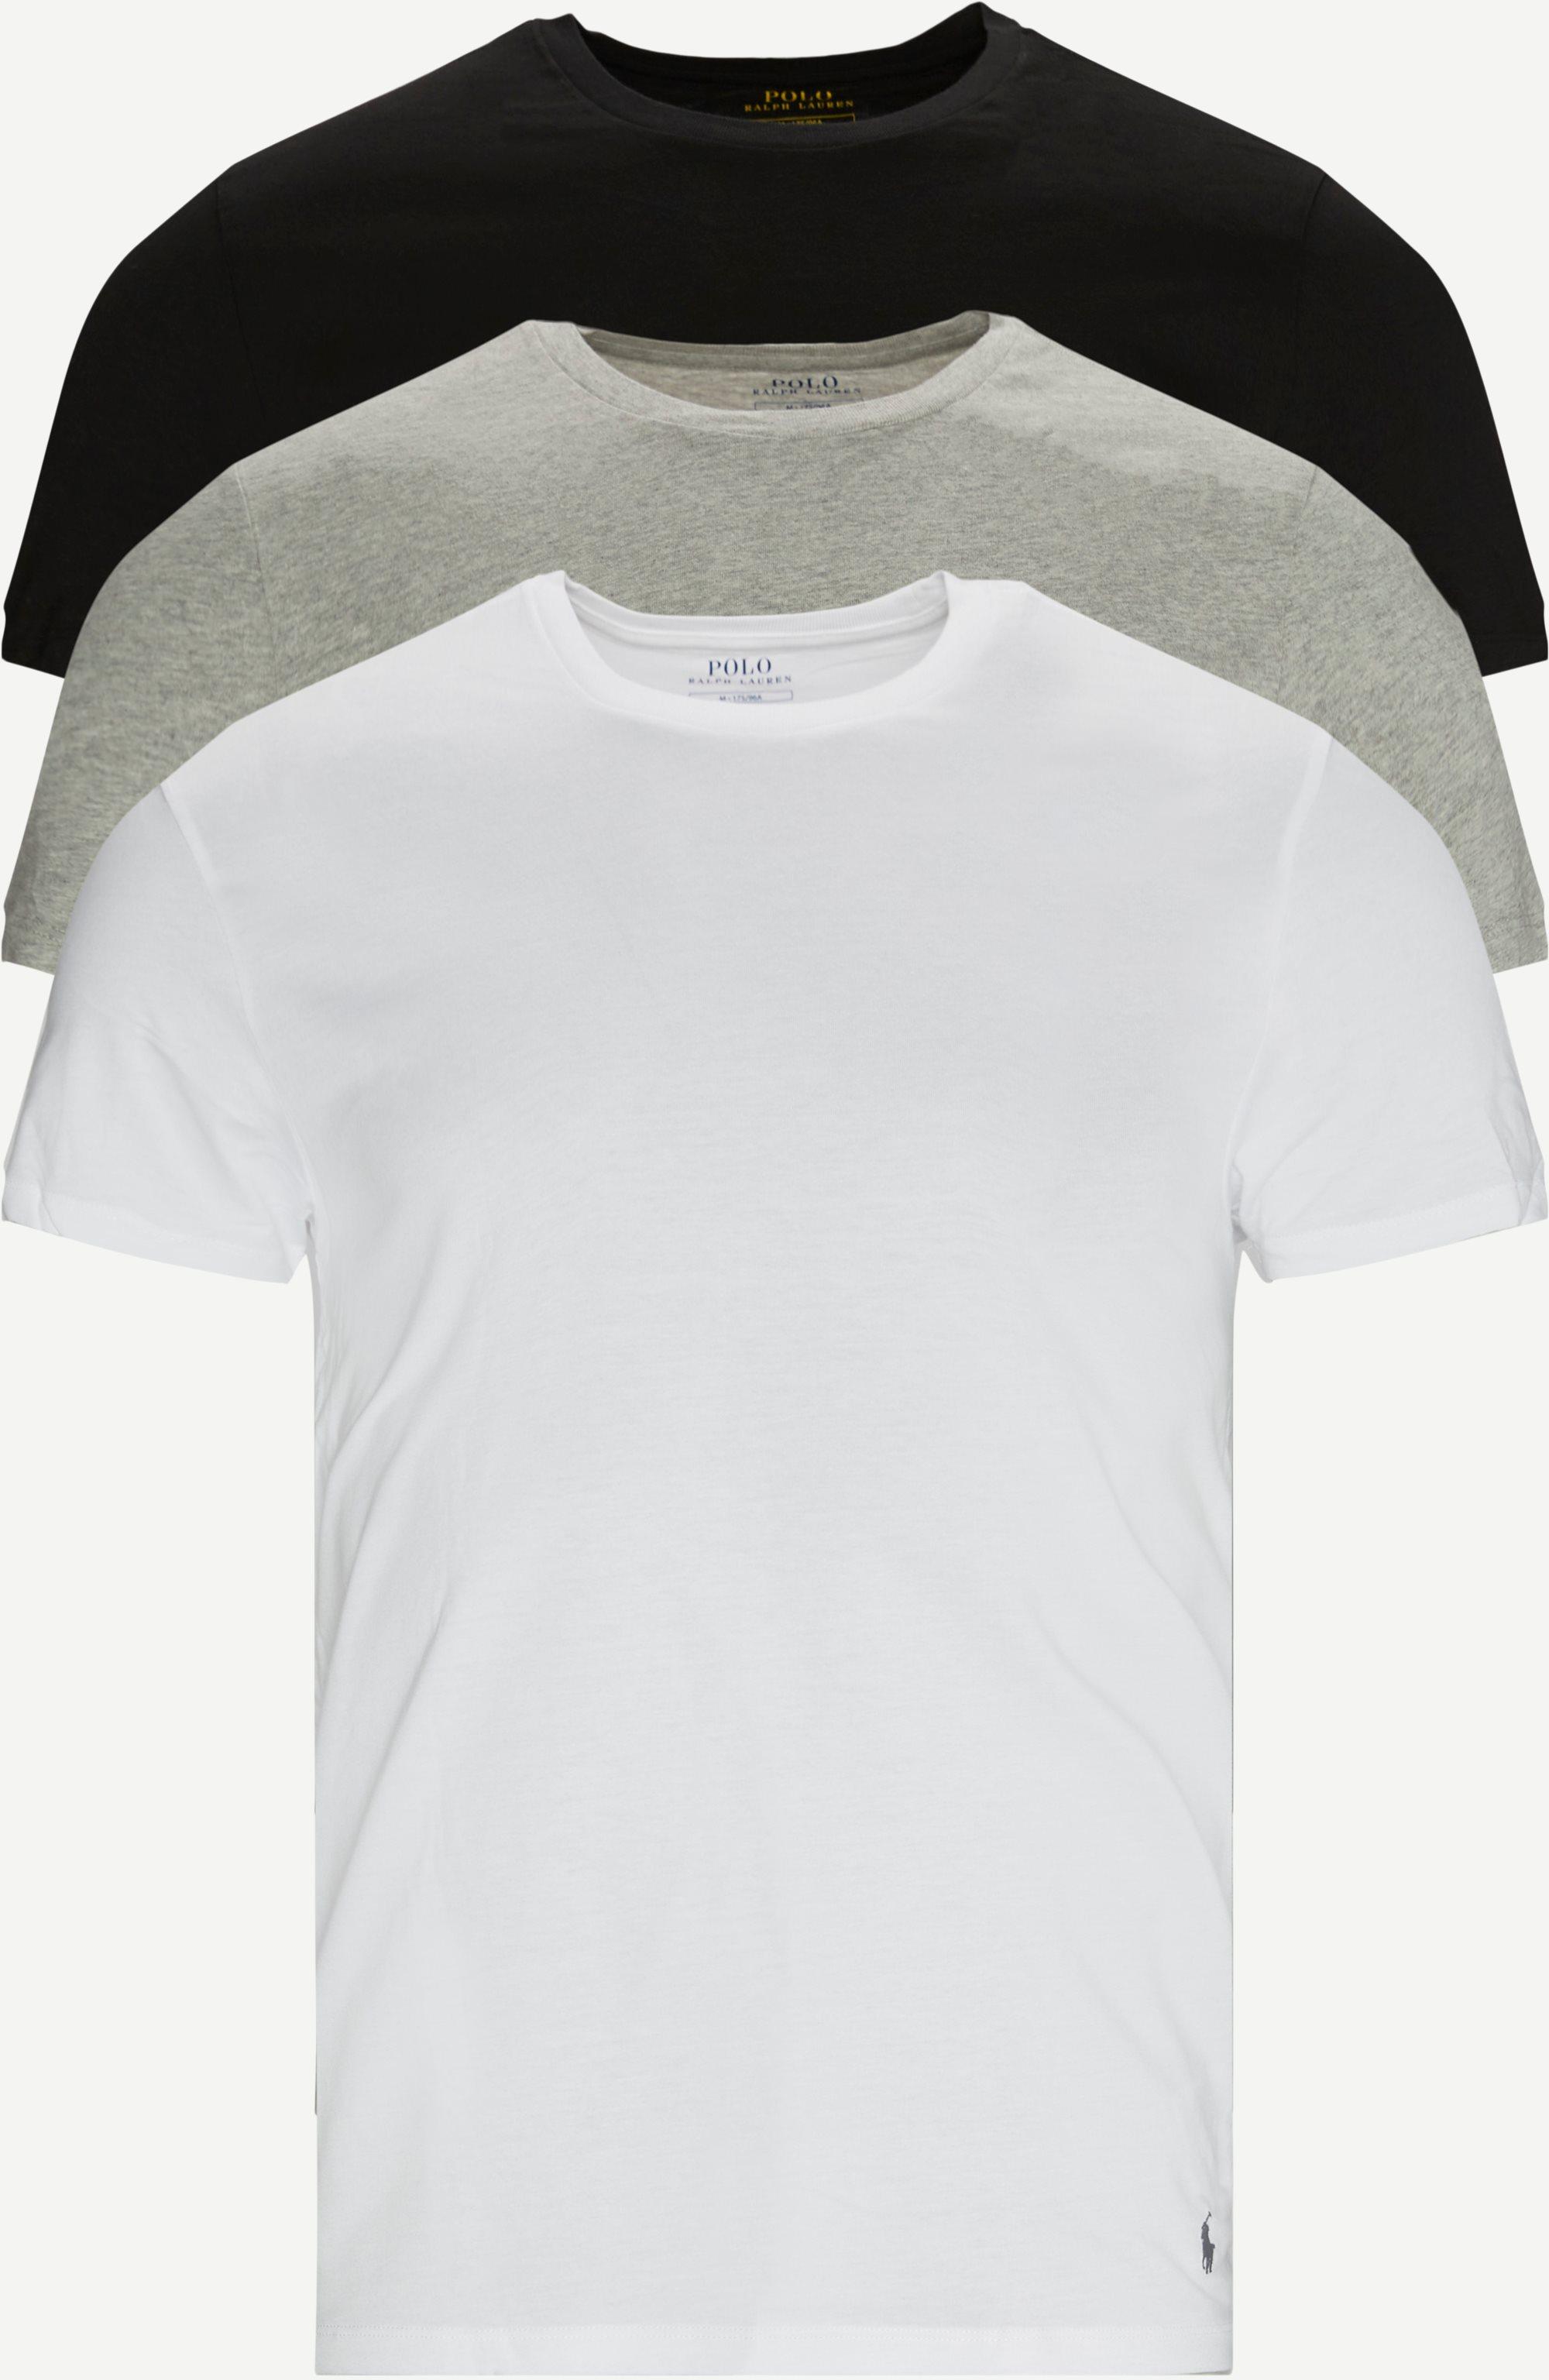 T-shirts - Regular fit - Multi